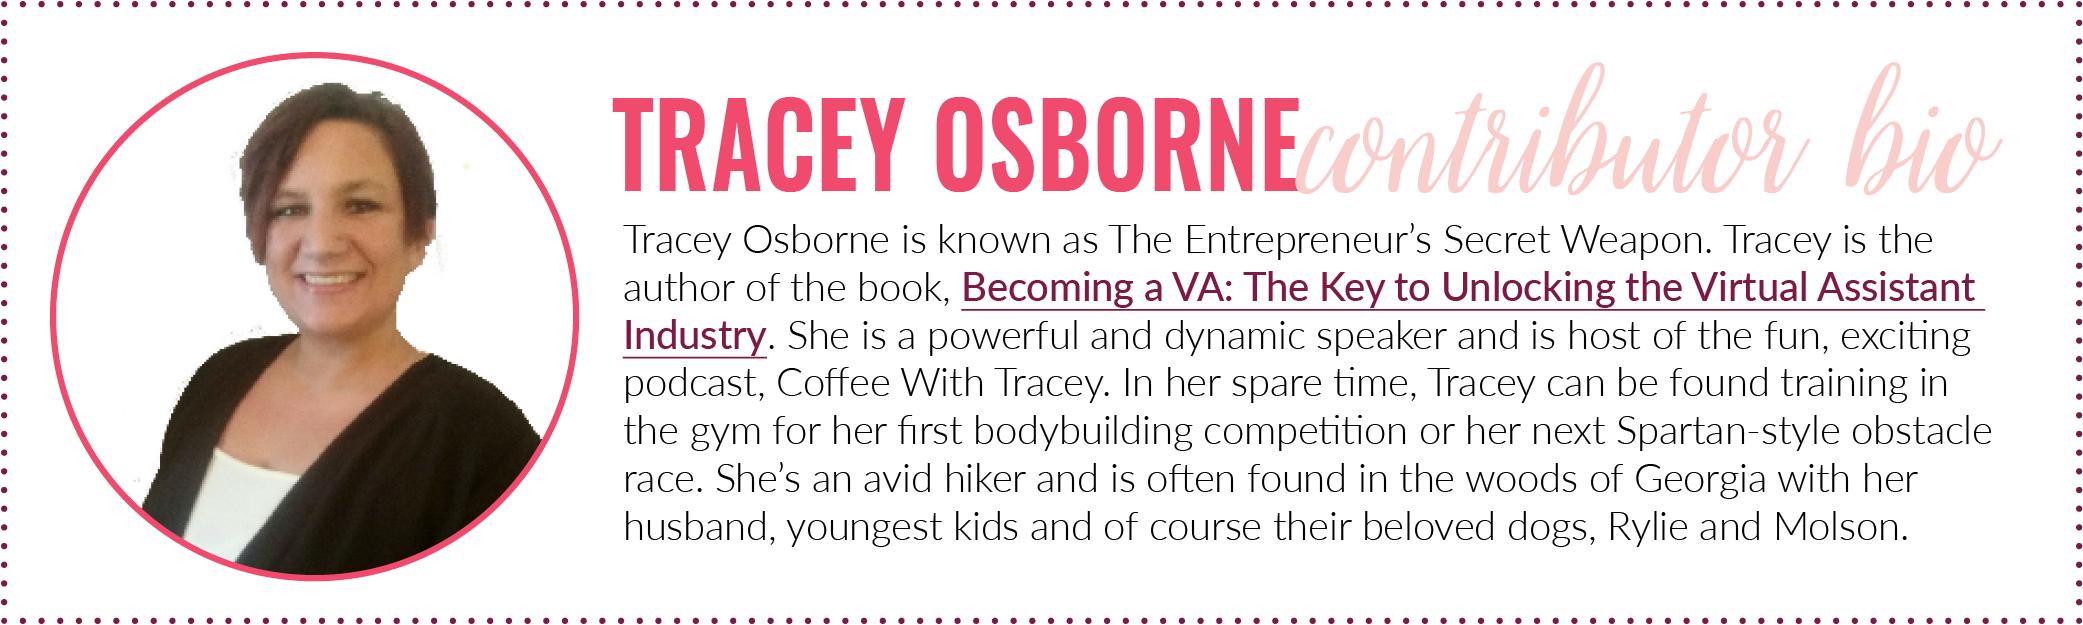 tracey-osborne-guest-post-bio